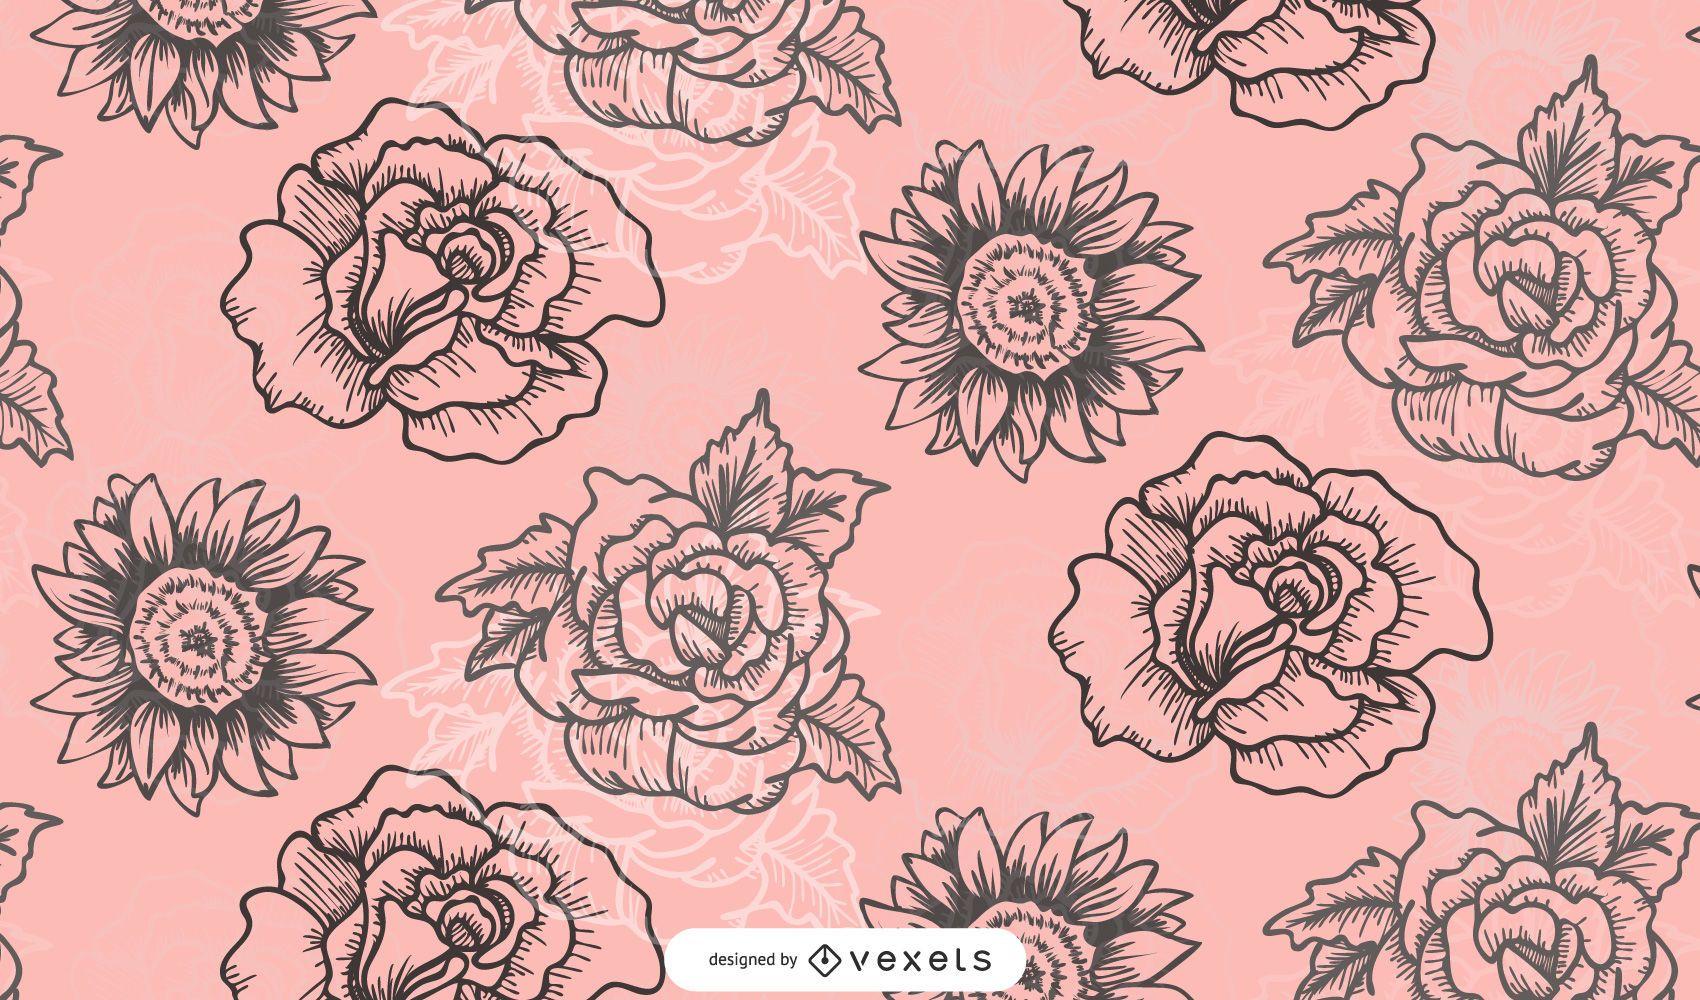 Estampa de flores de design de moda